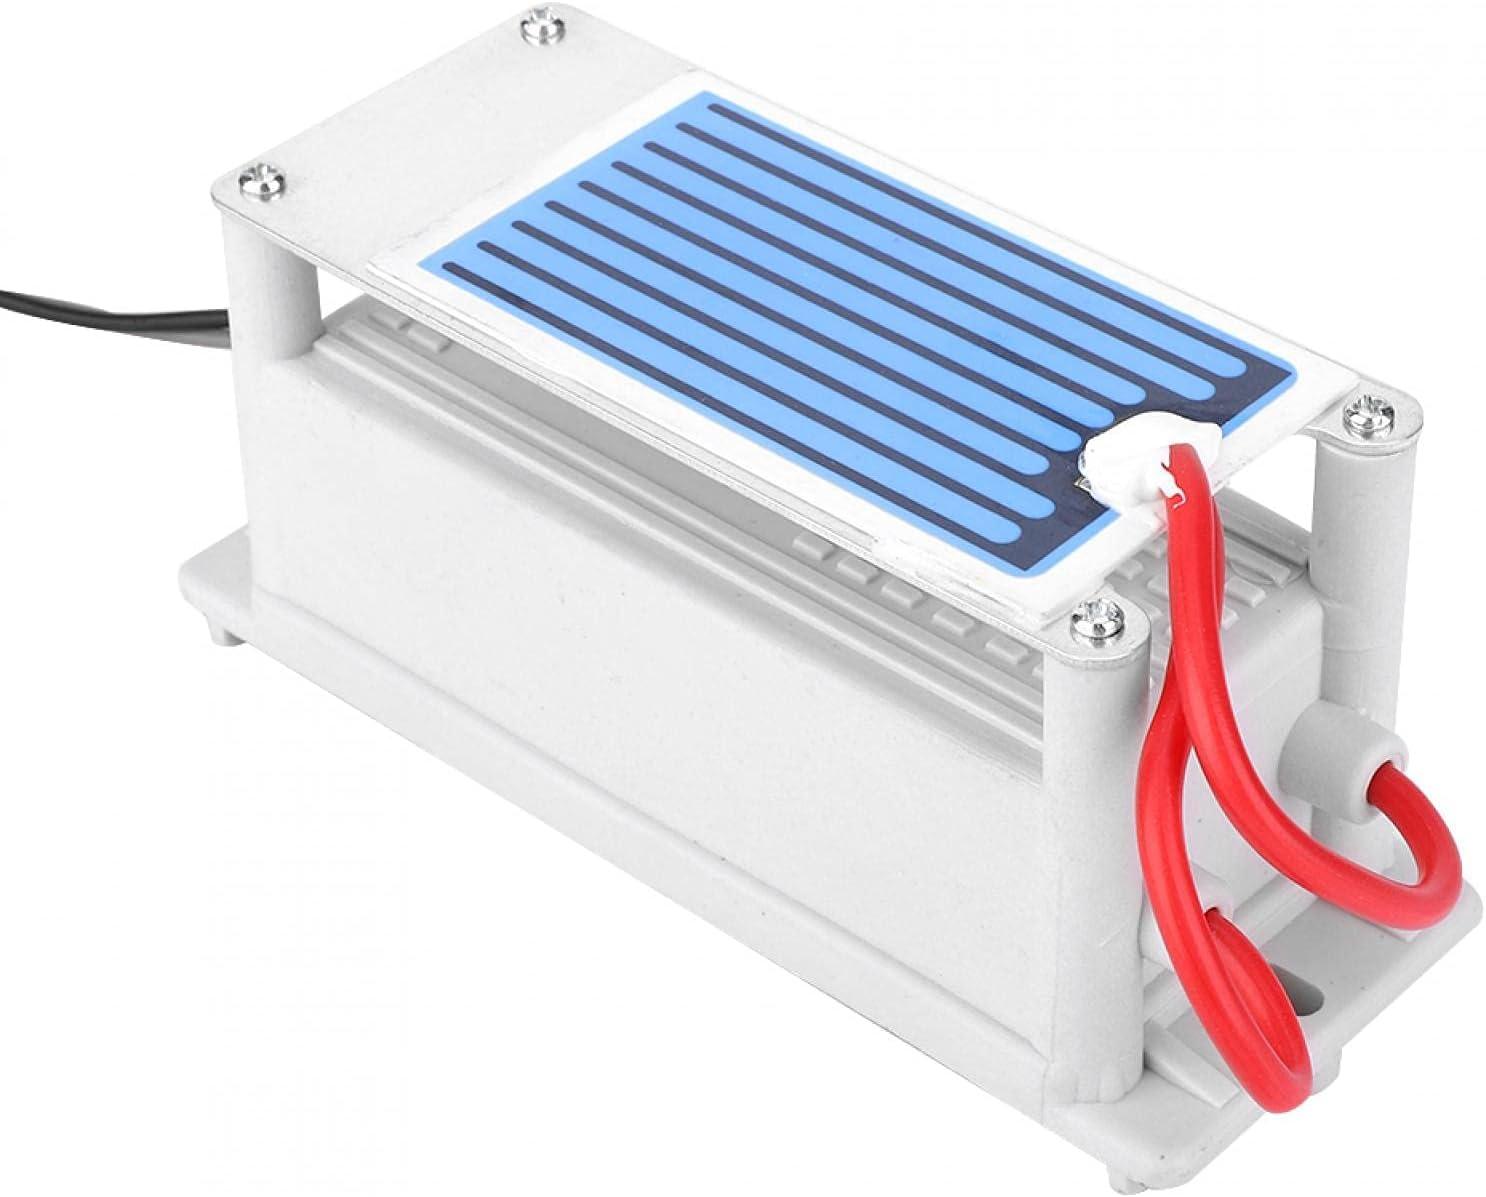 Nannigr O3 Sacramento Mall Fashion Air Cleaner Industrial Purifier Ionizer Easy